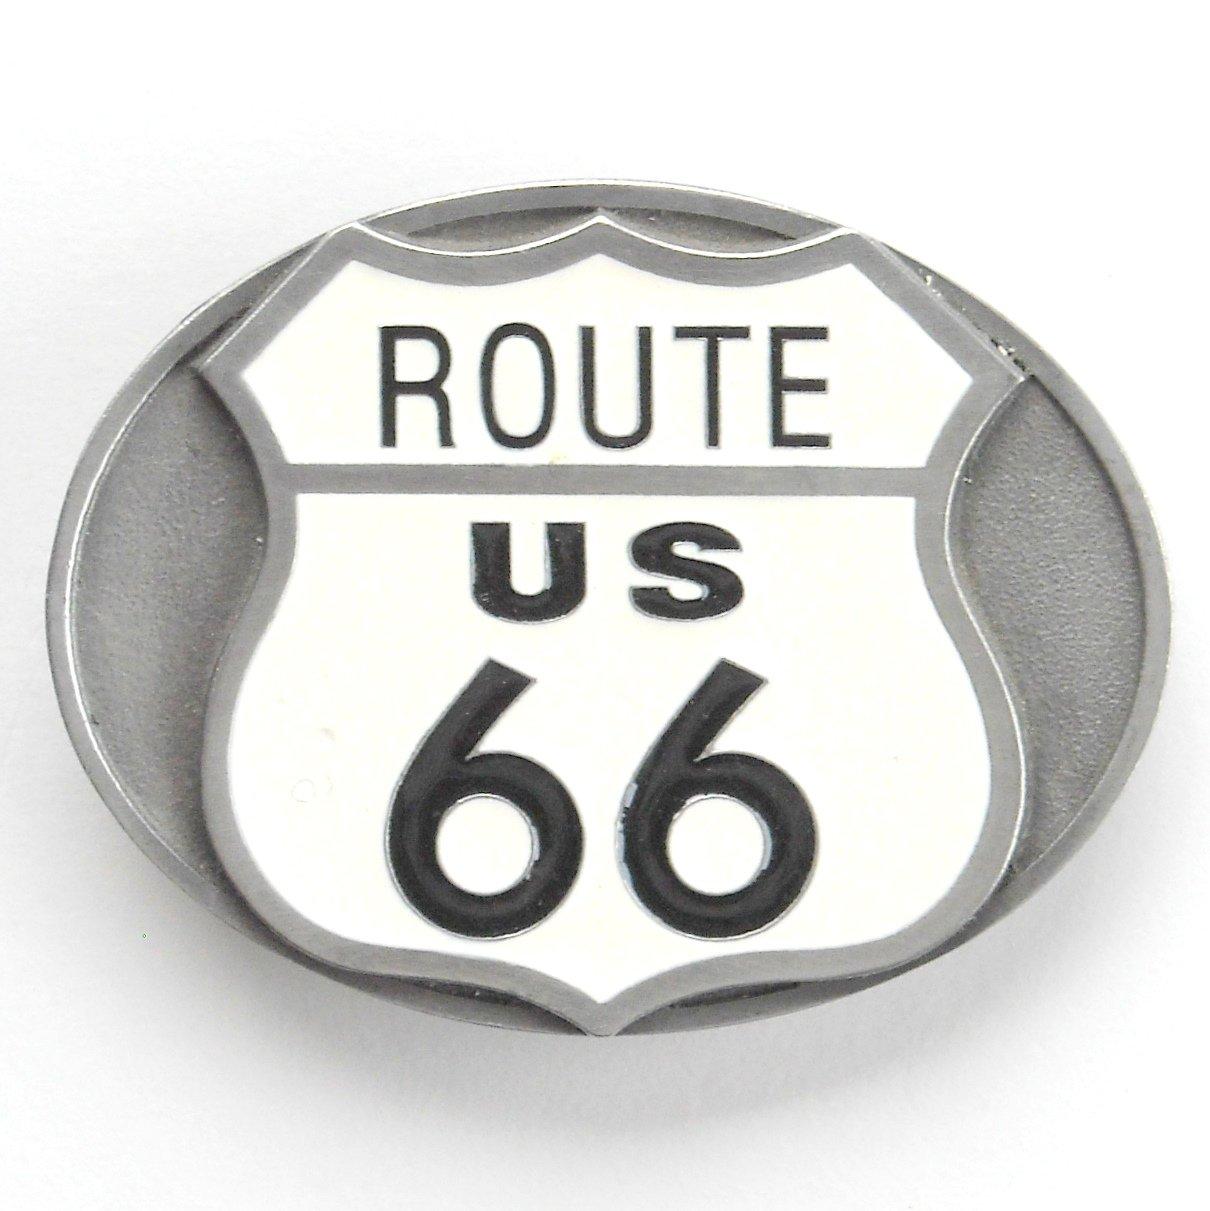 Route US 66 Vintage Siskiyou Pewter Belt Buckle